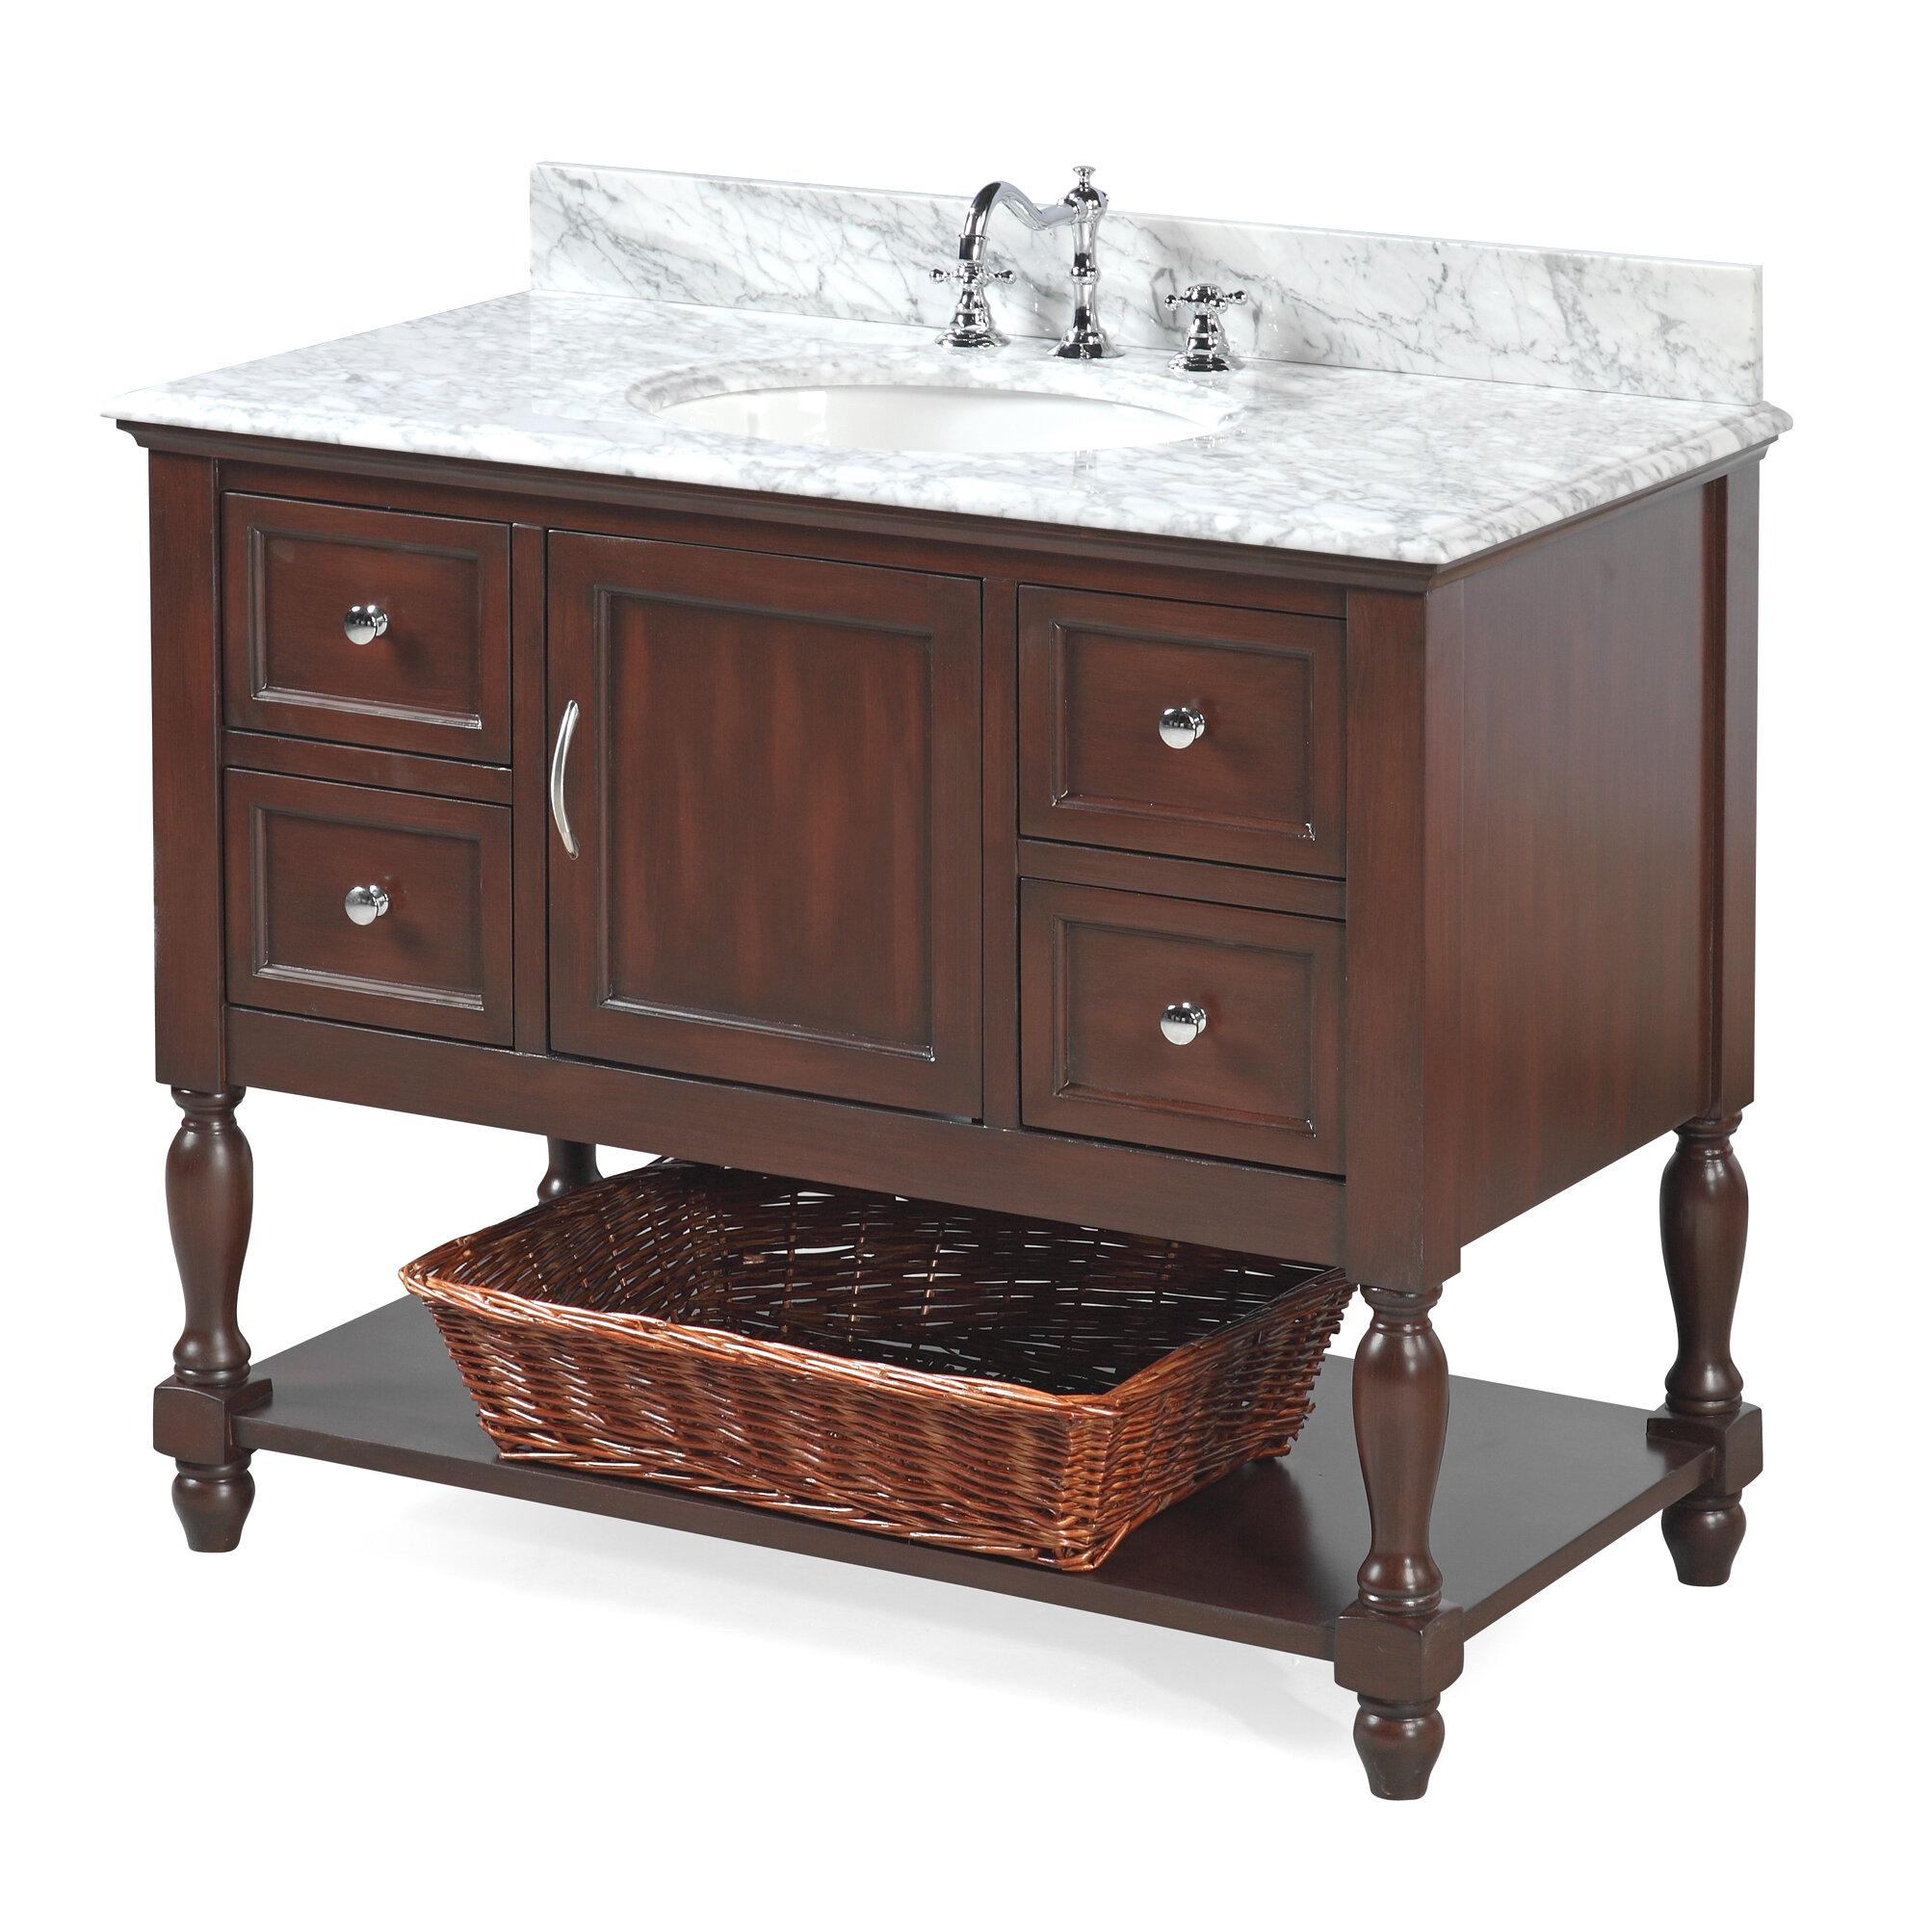 cf bathroom p room inch catalinda furniture pin petite chans powder white vanity